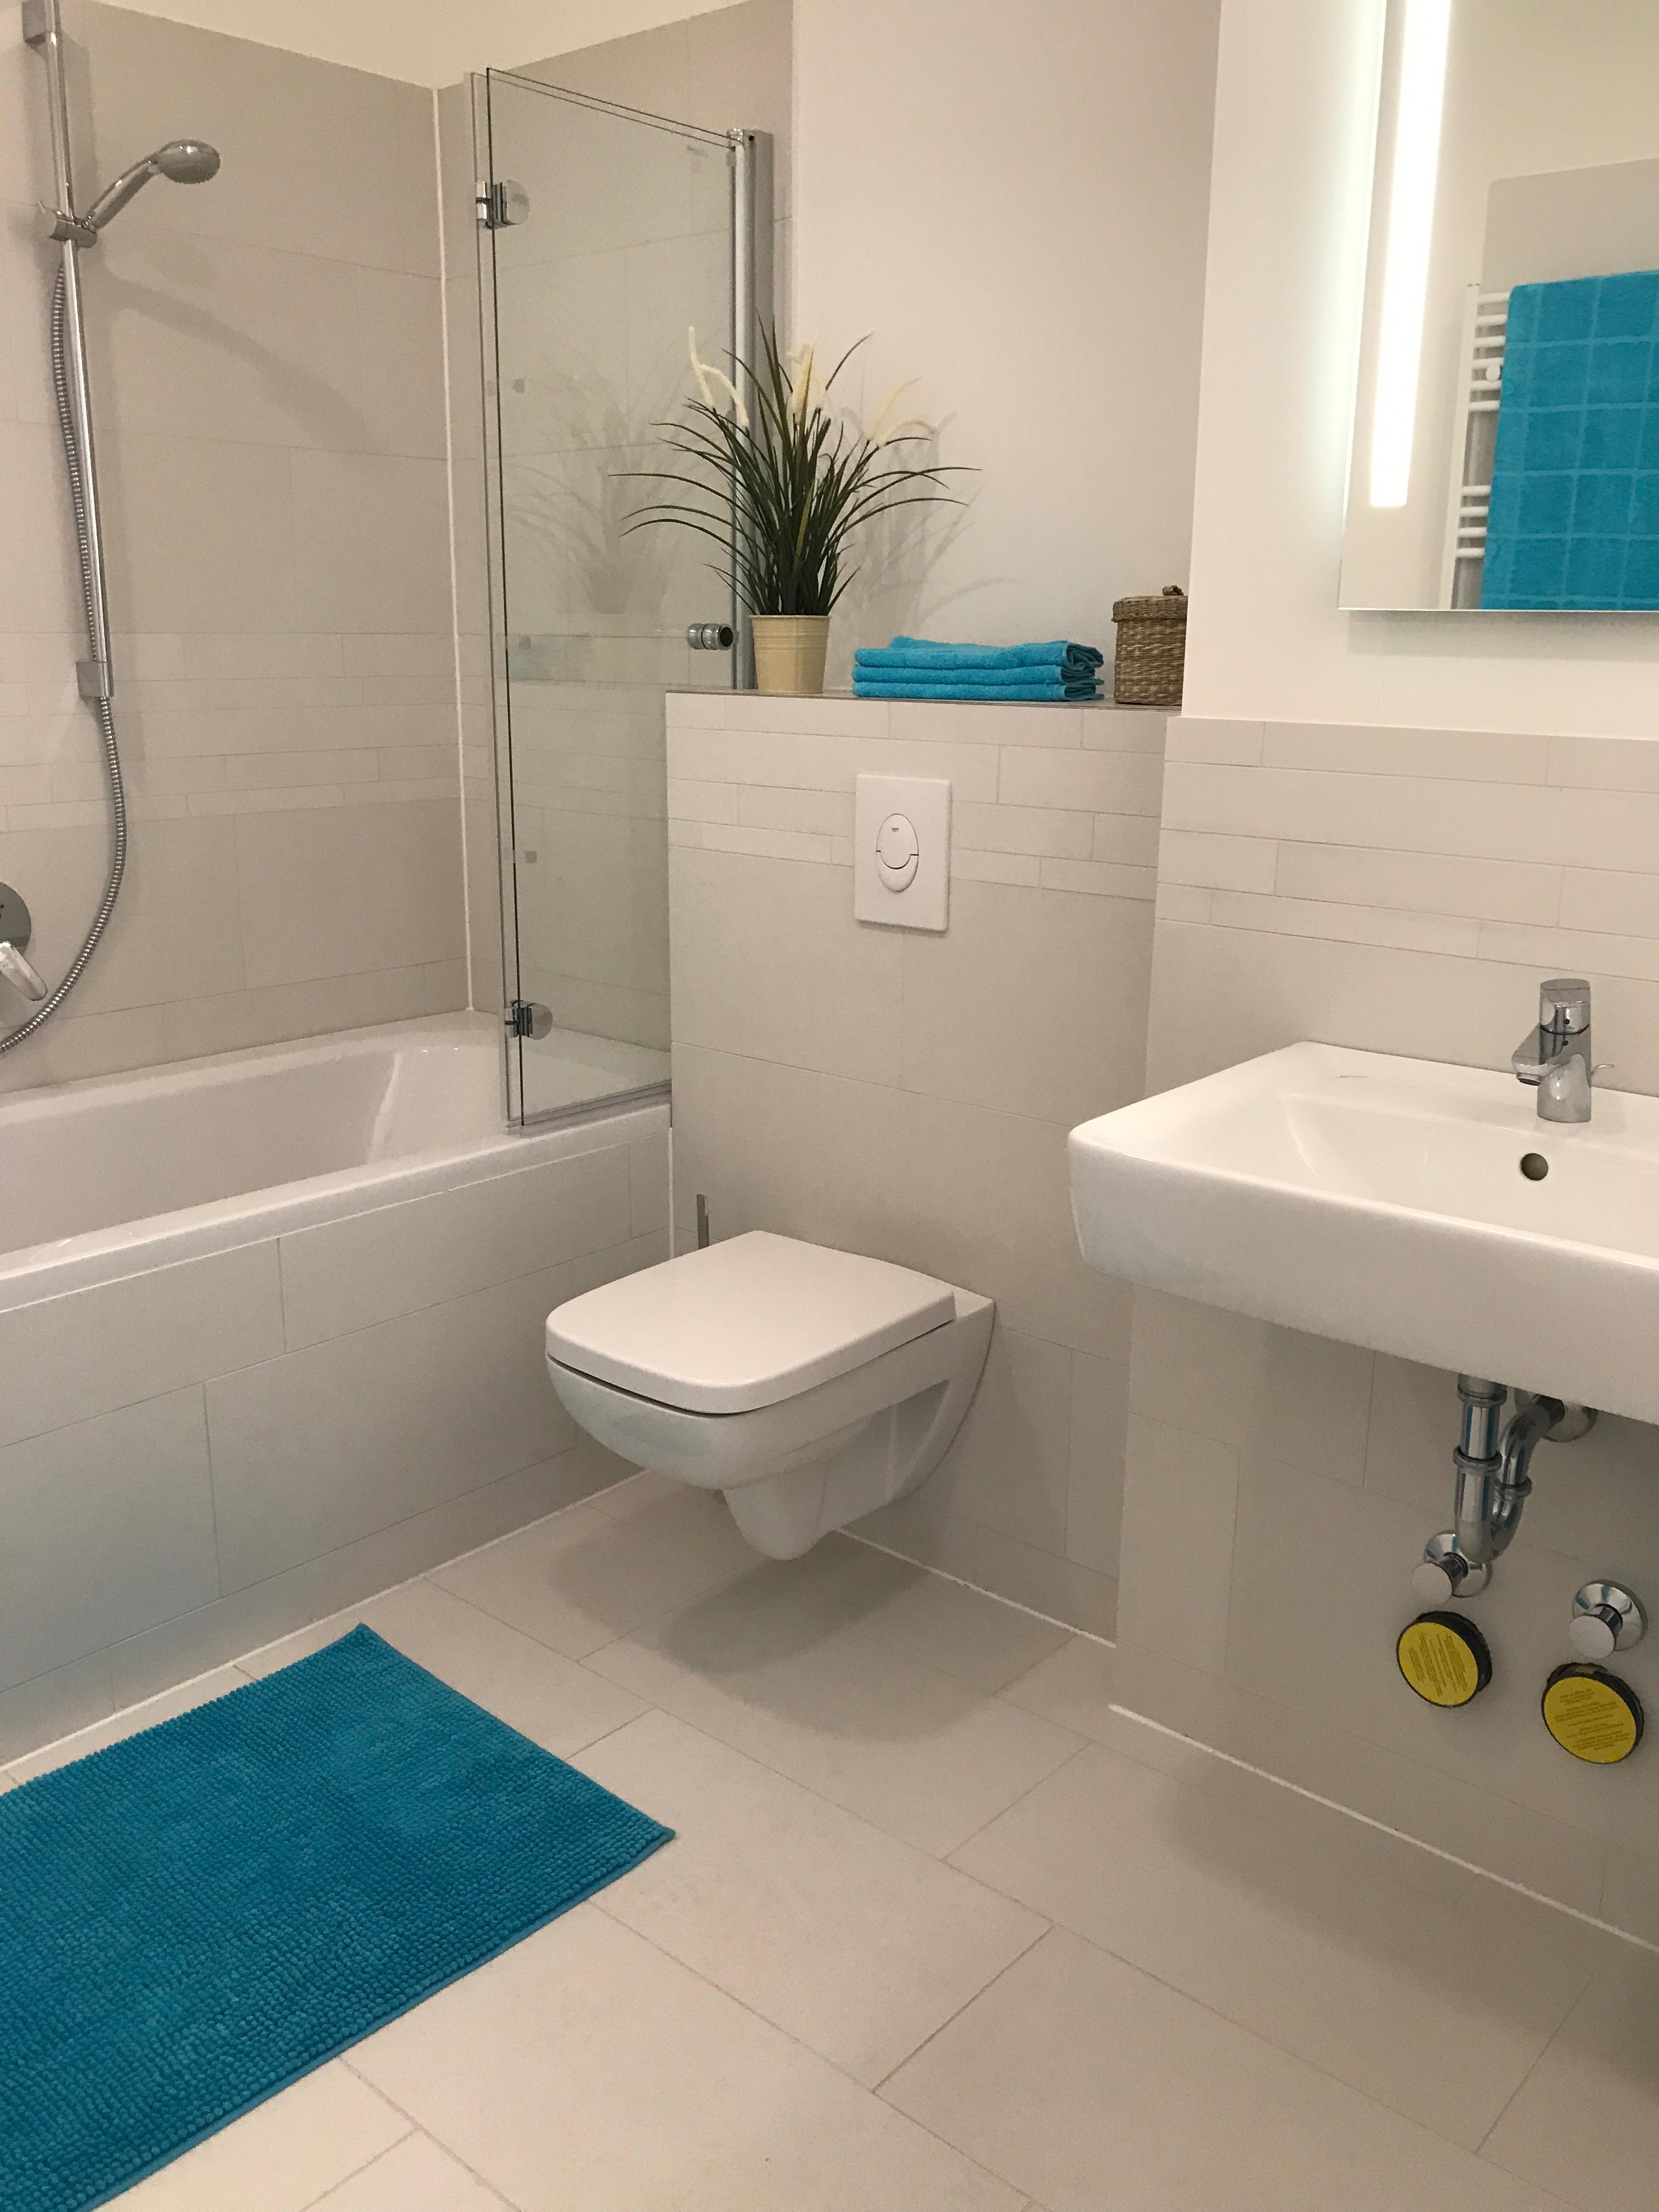 Badezimmer Weiß #badezimmer ©Miracle Room • COUCH